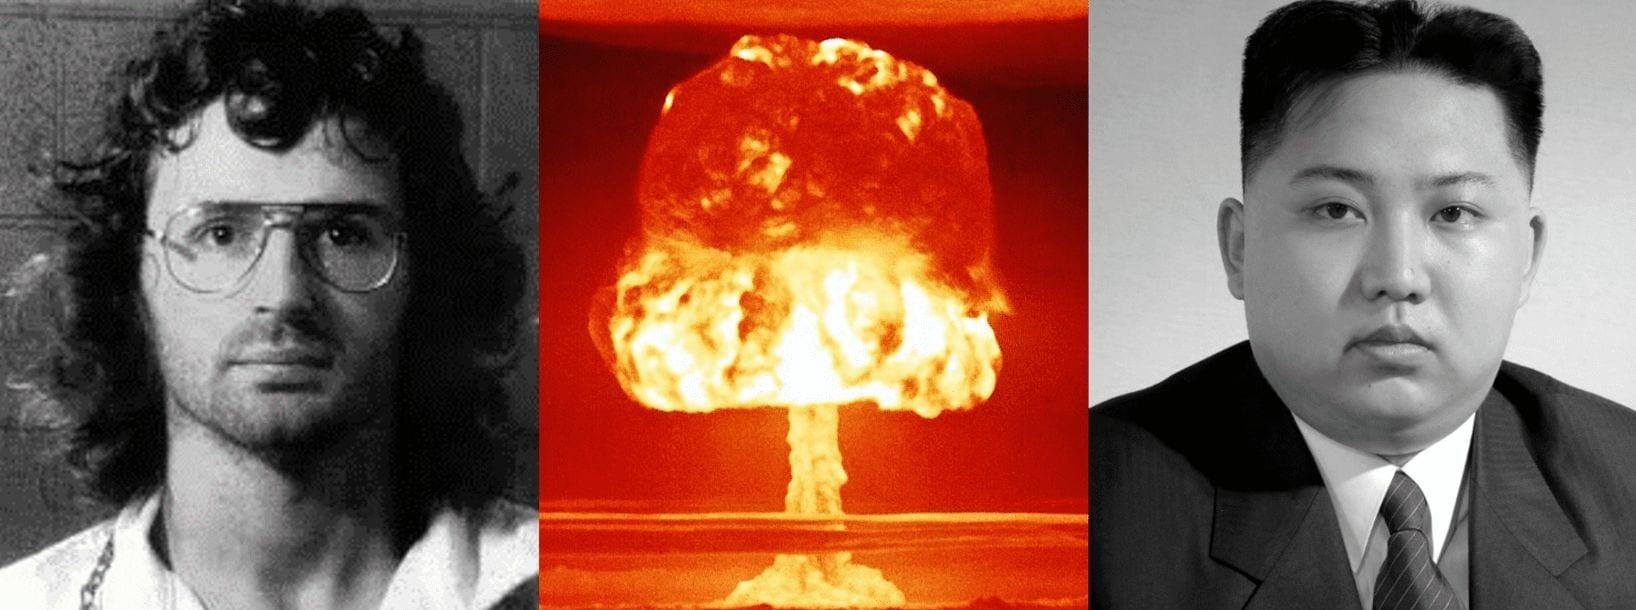 North Korea: Hopefully Not a Potential Global Waco?